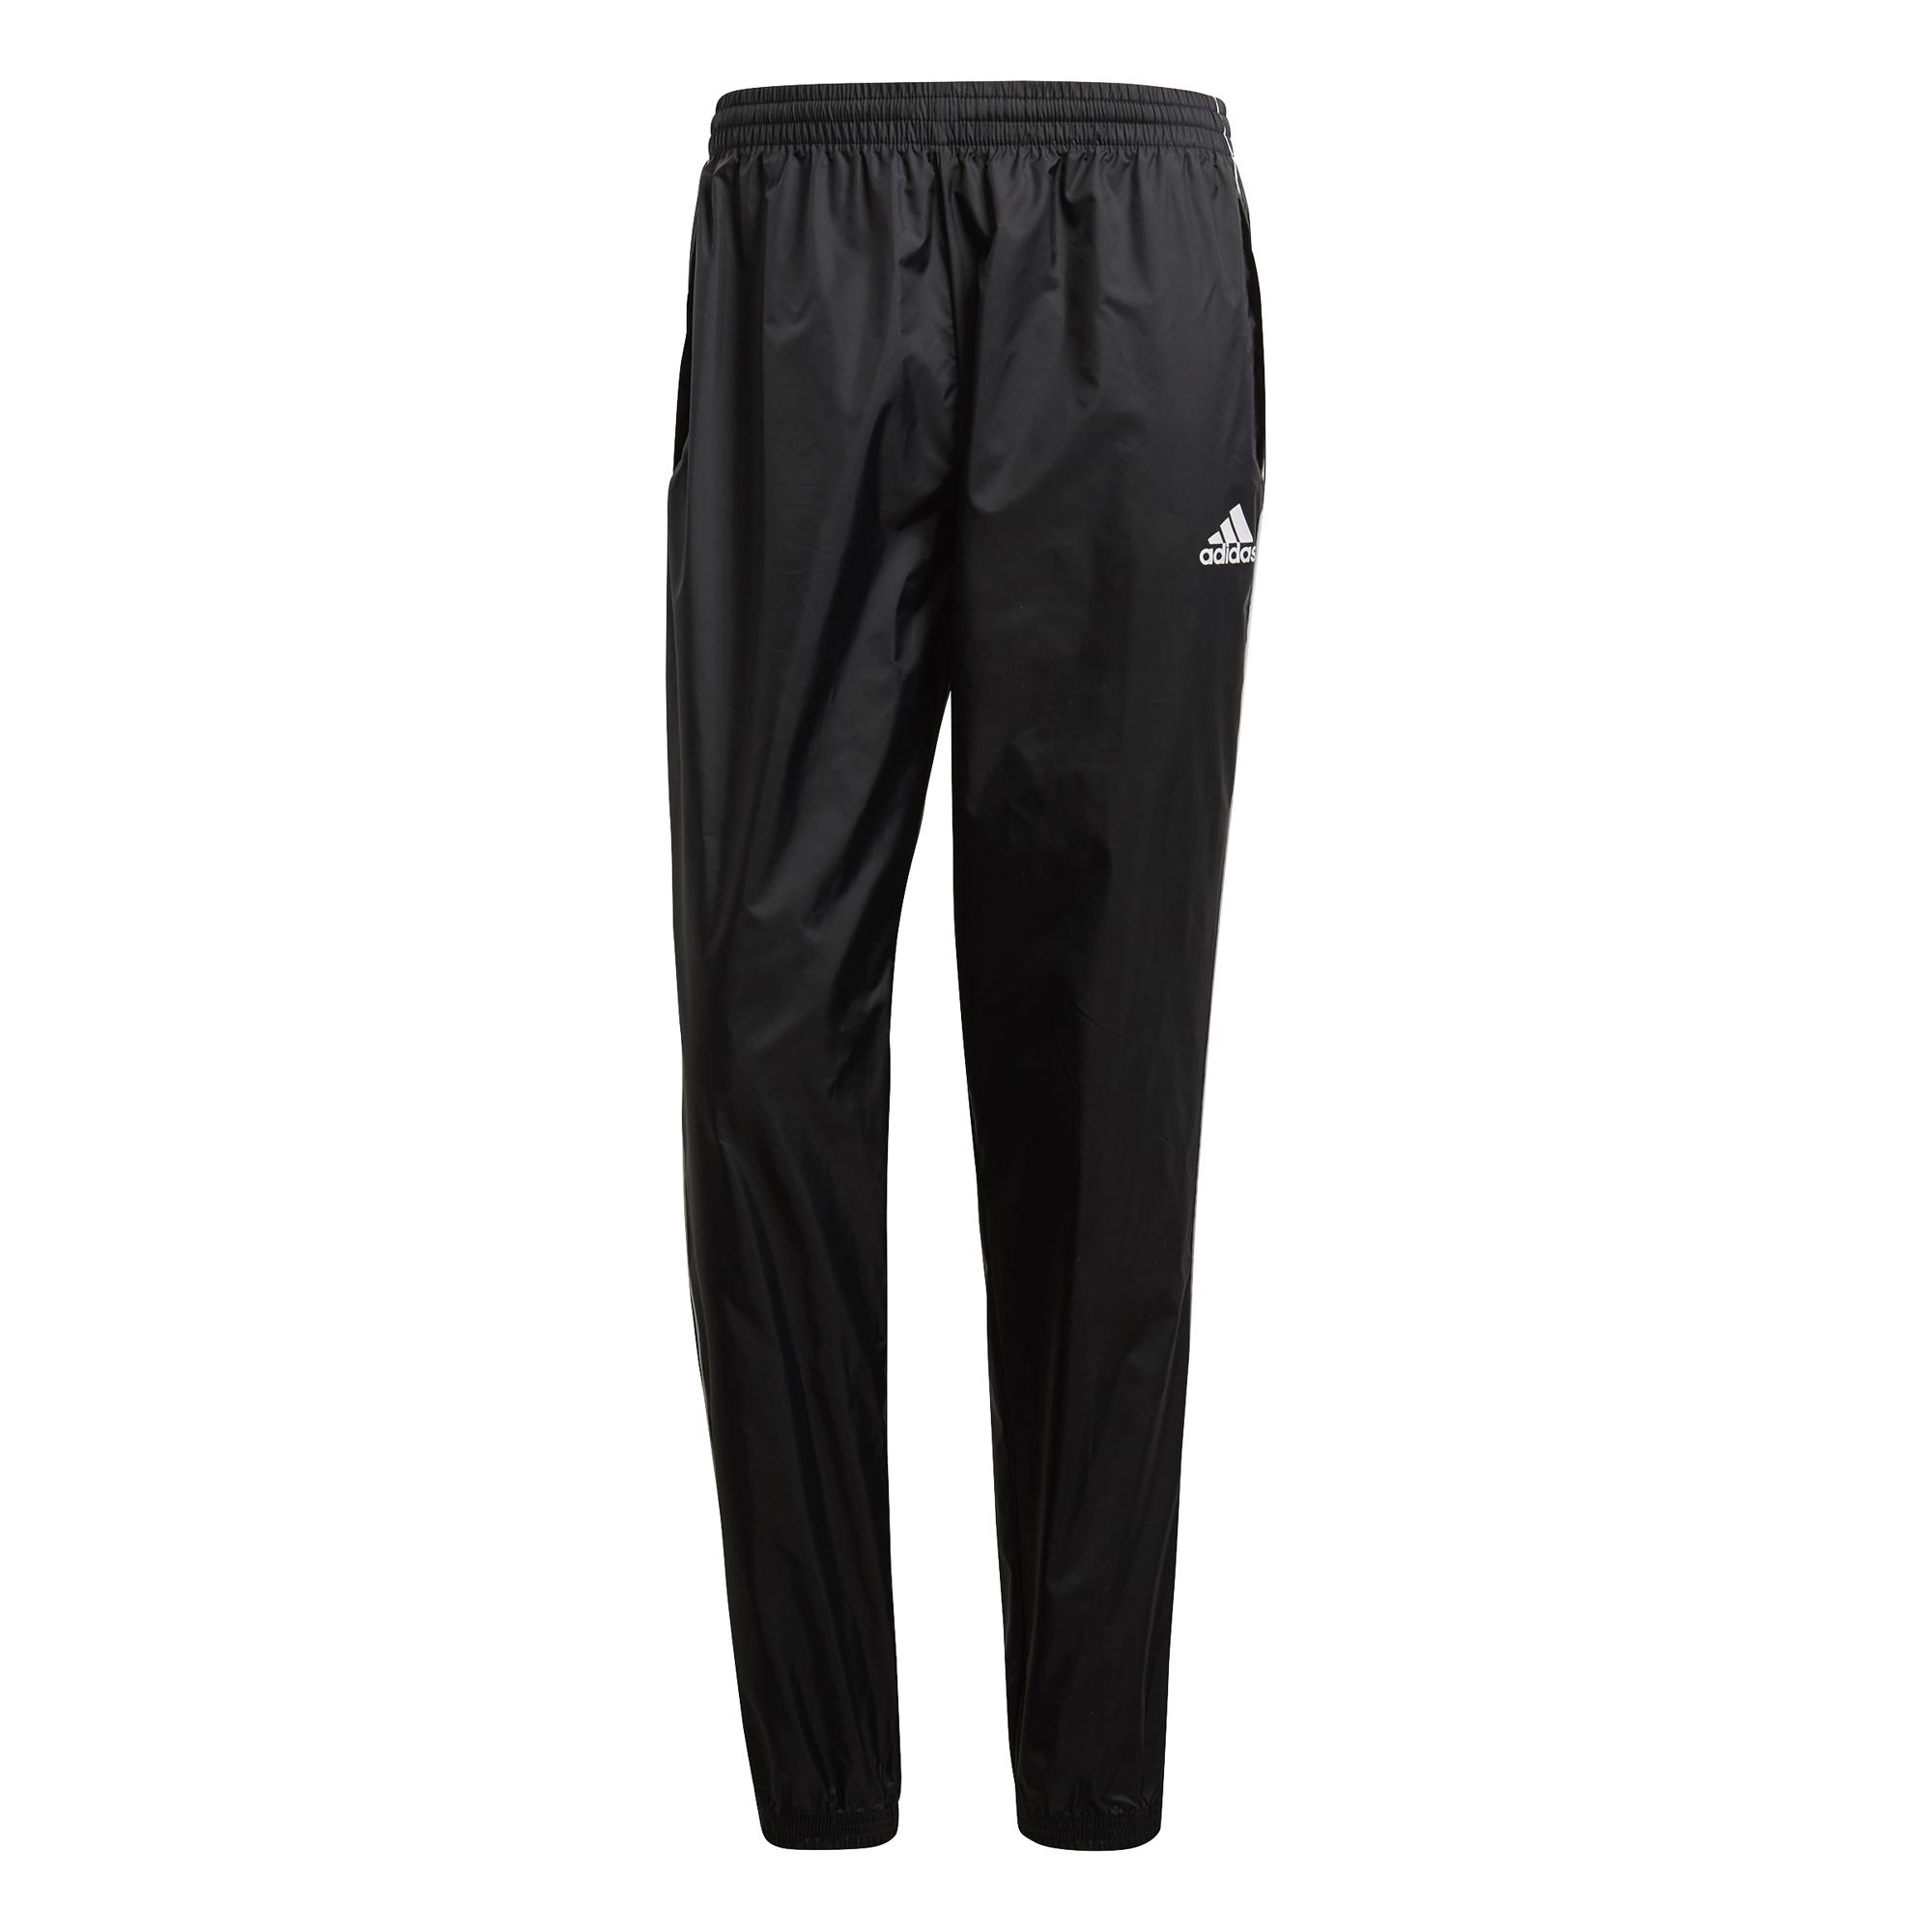 ADIDAS šusťákové kalhoty Core 18 Rain Pant